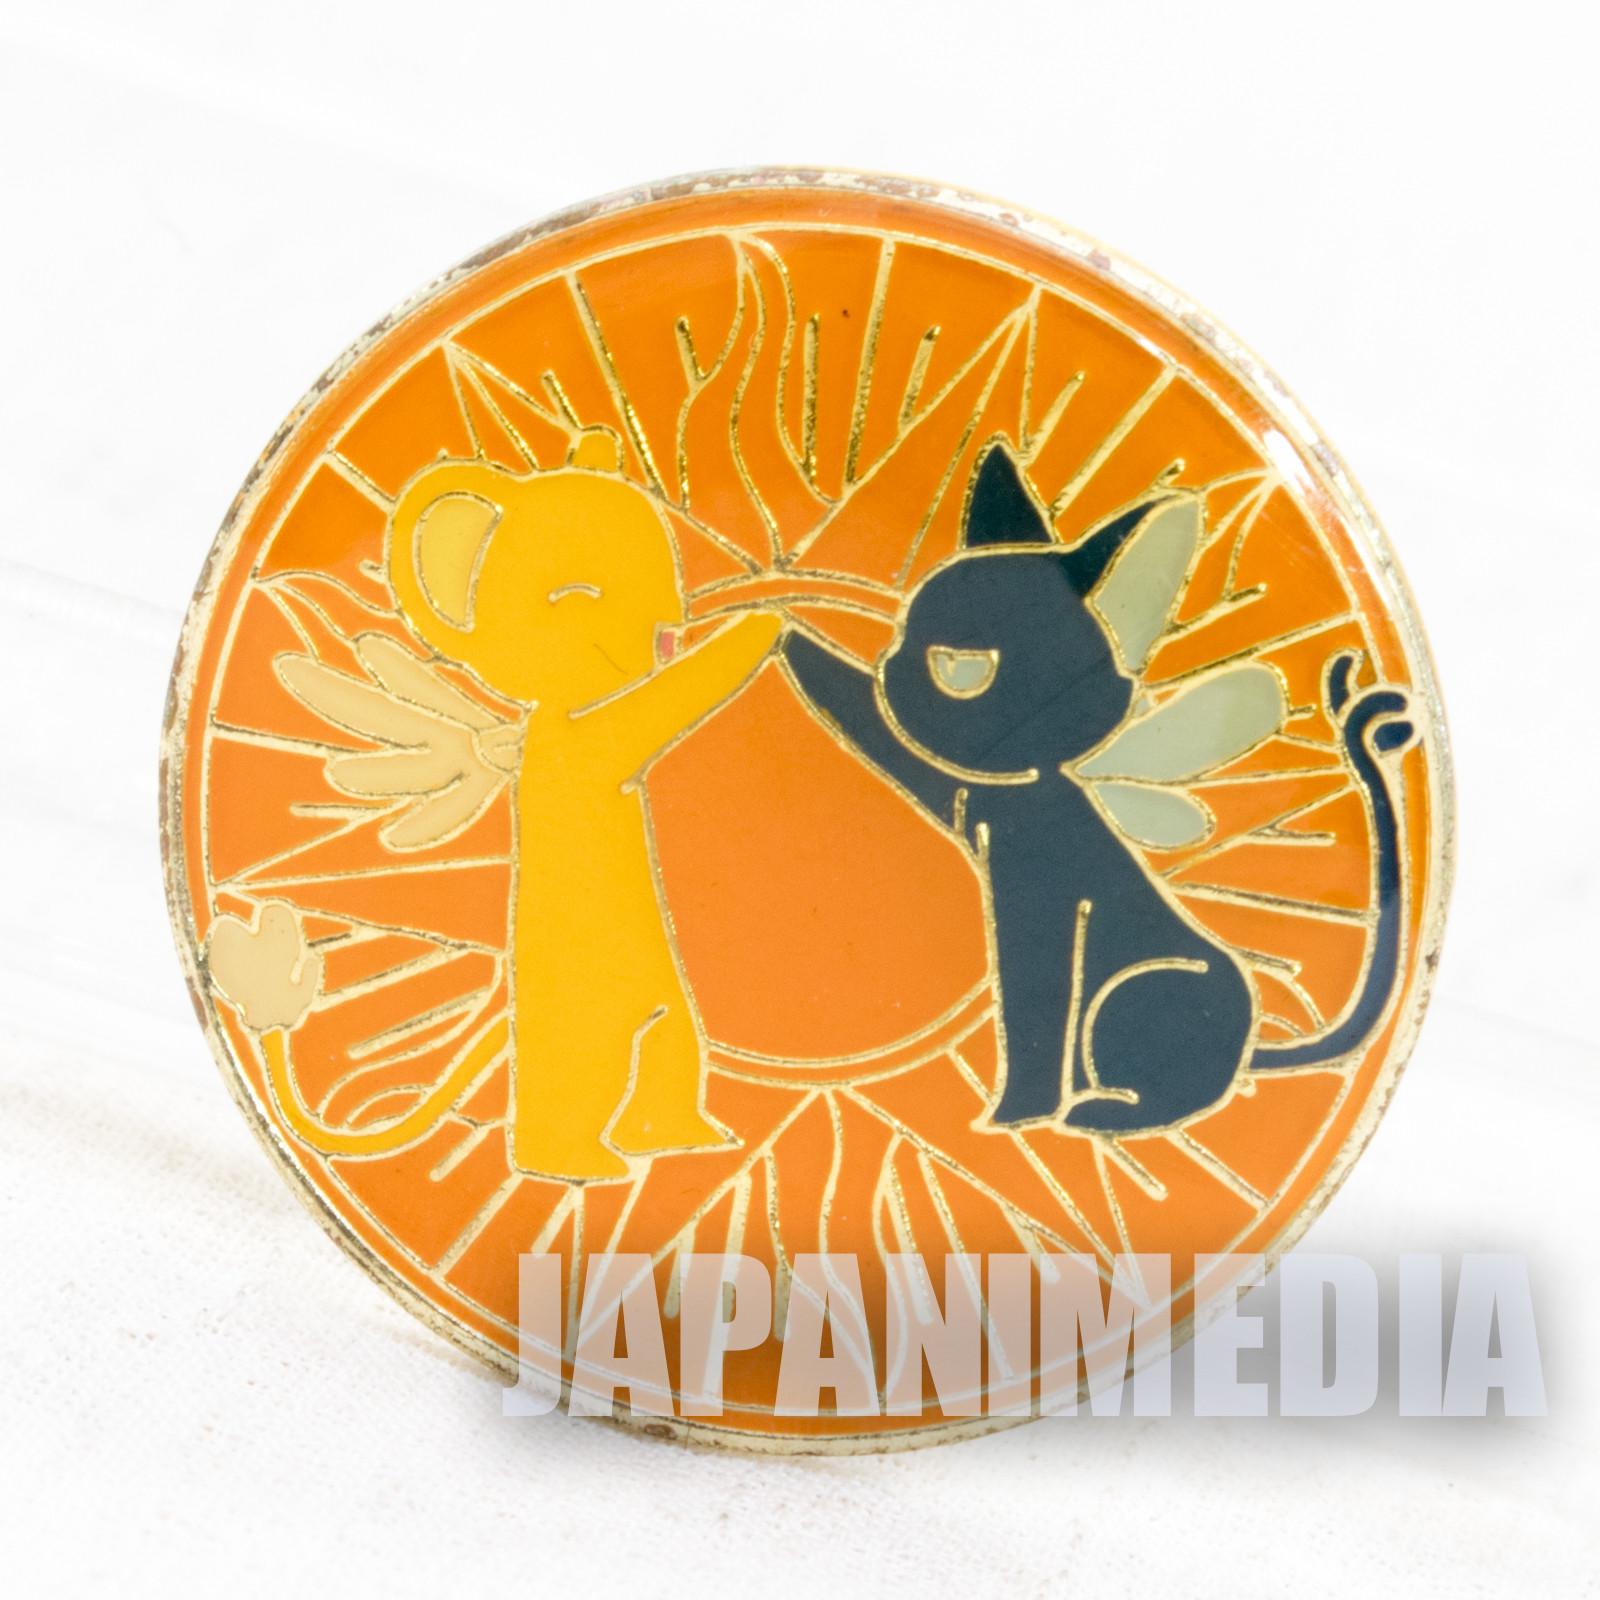 Cardcaptor Sakura Kero-chan & Spinel Sun Sakura Pins CLAMP JAPAN ANIME #18